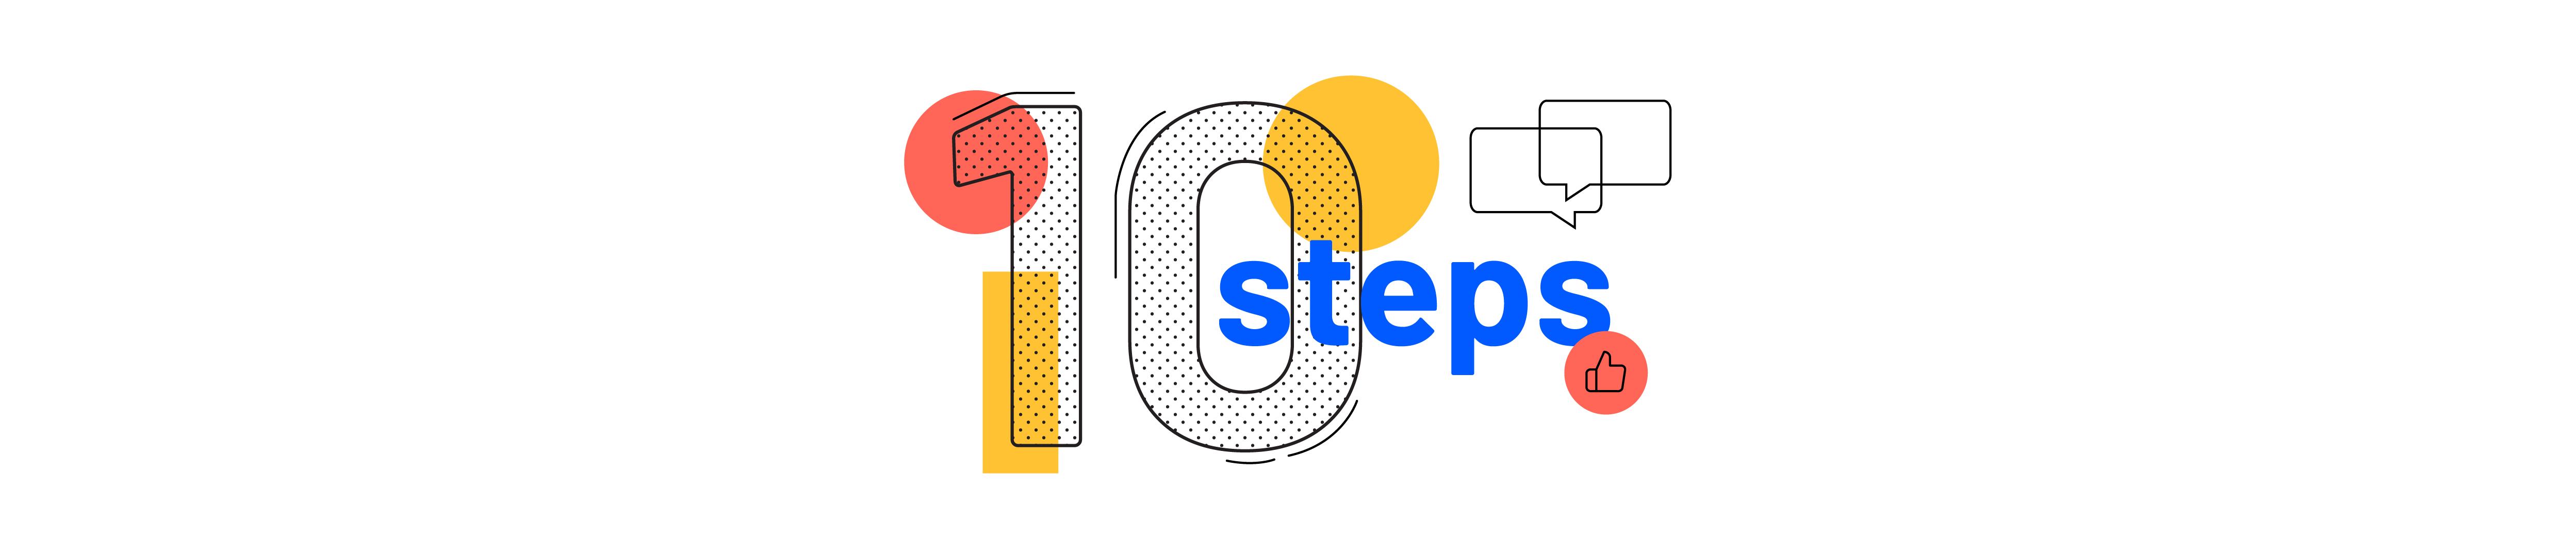 All hands 10 steps sign